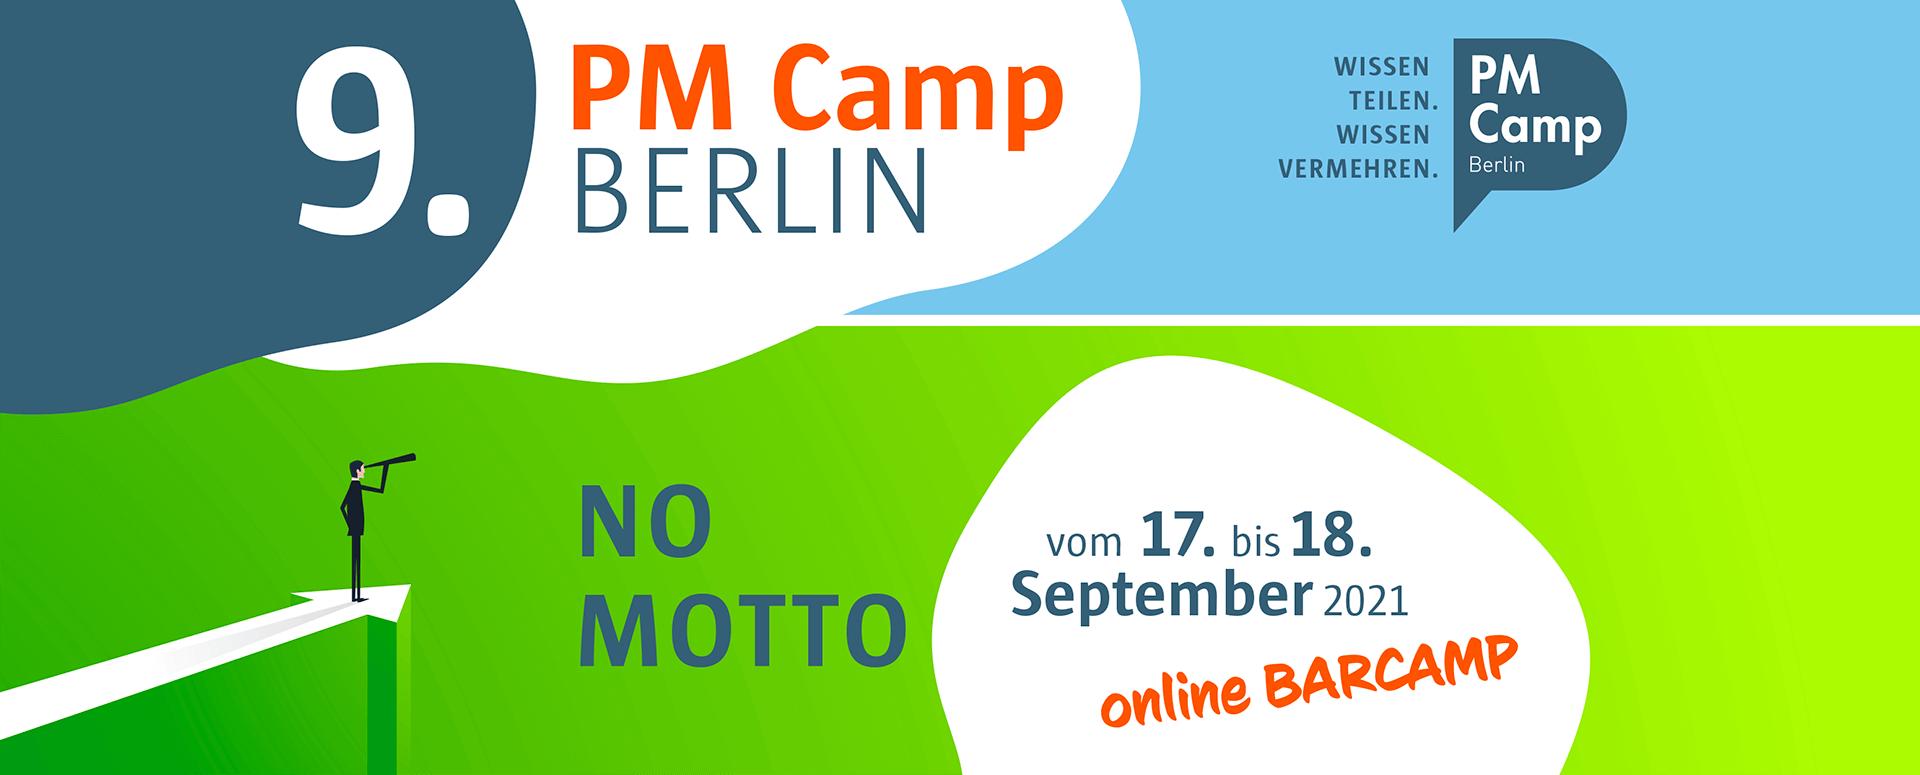 PM Camp Berlin - No Motto - 17./18.09.21